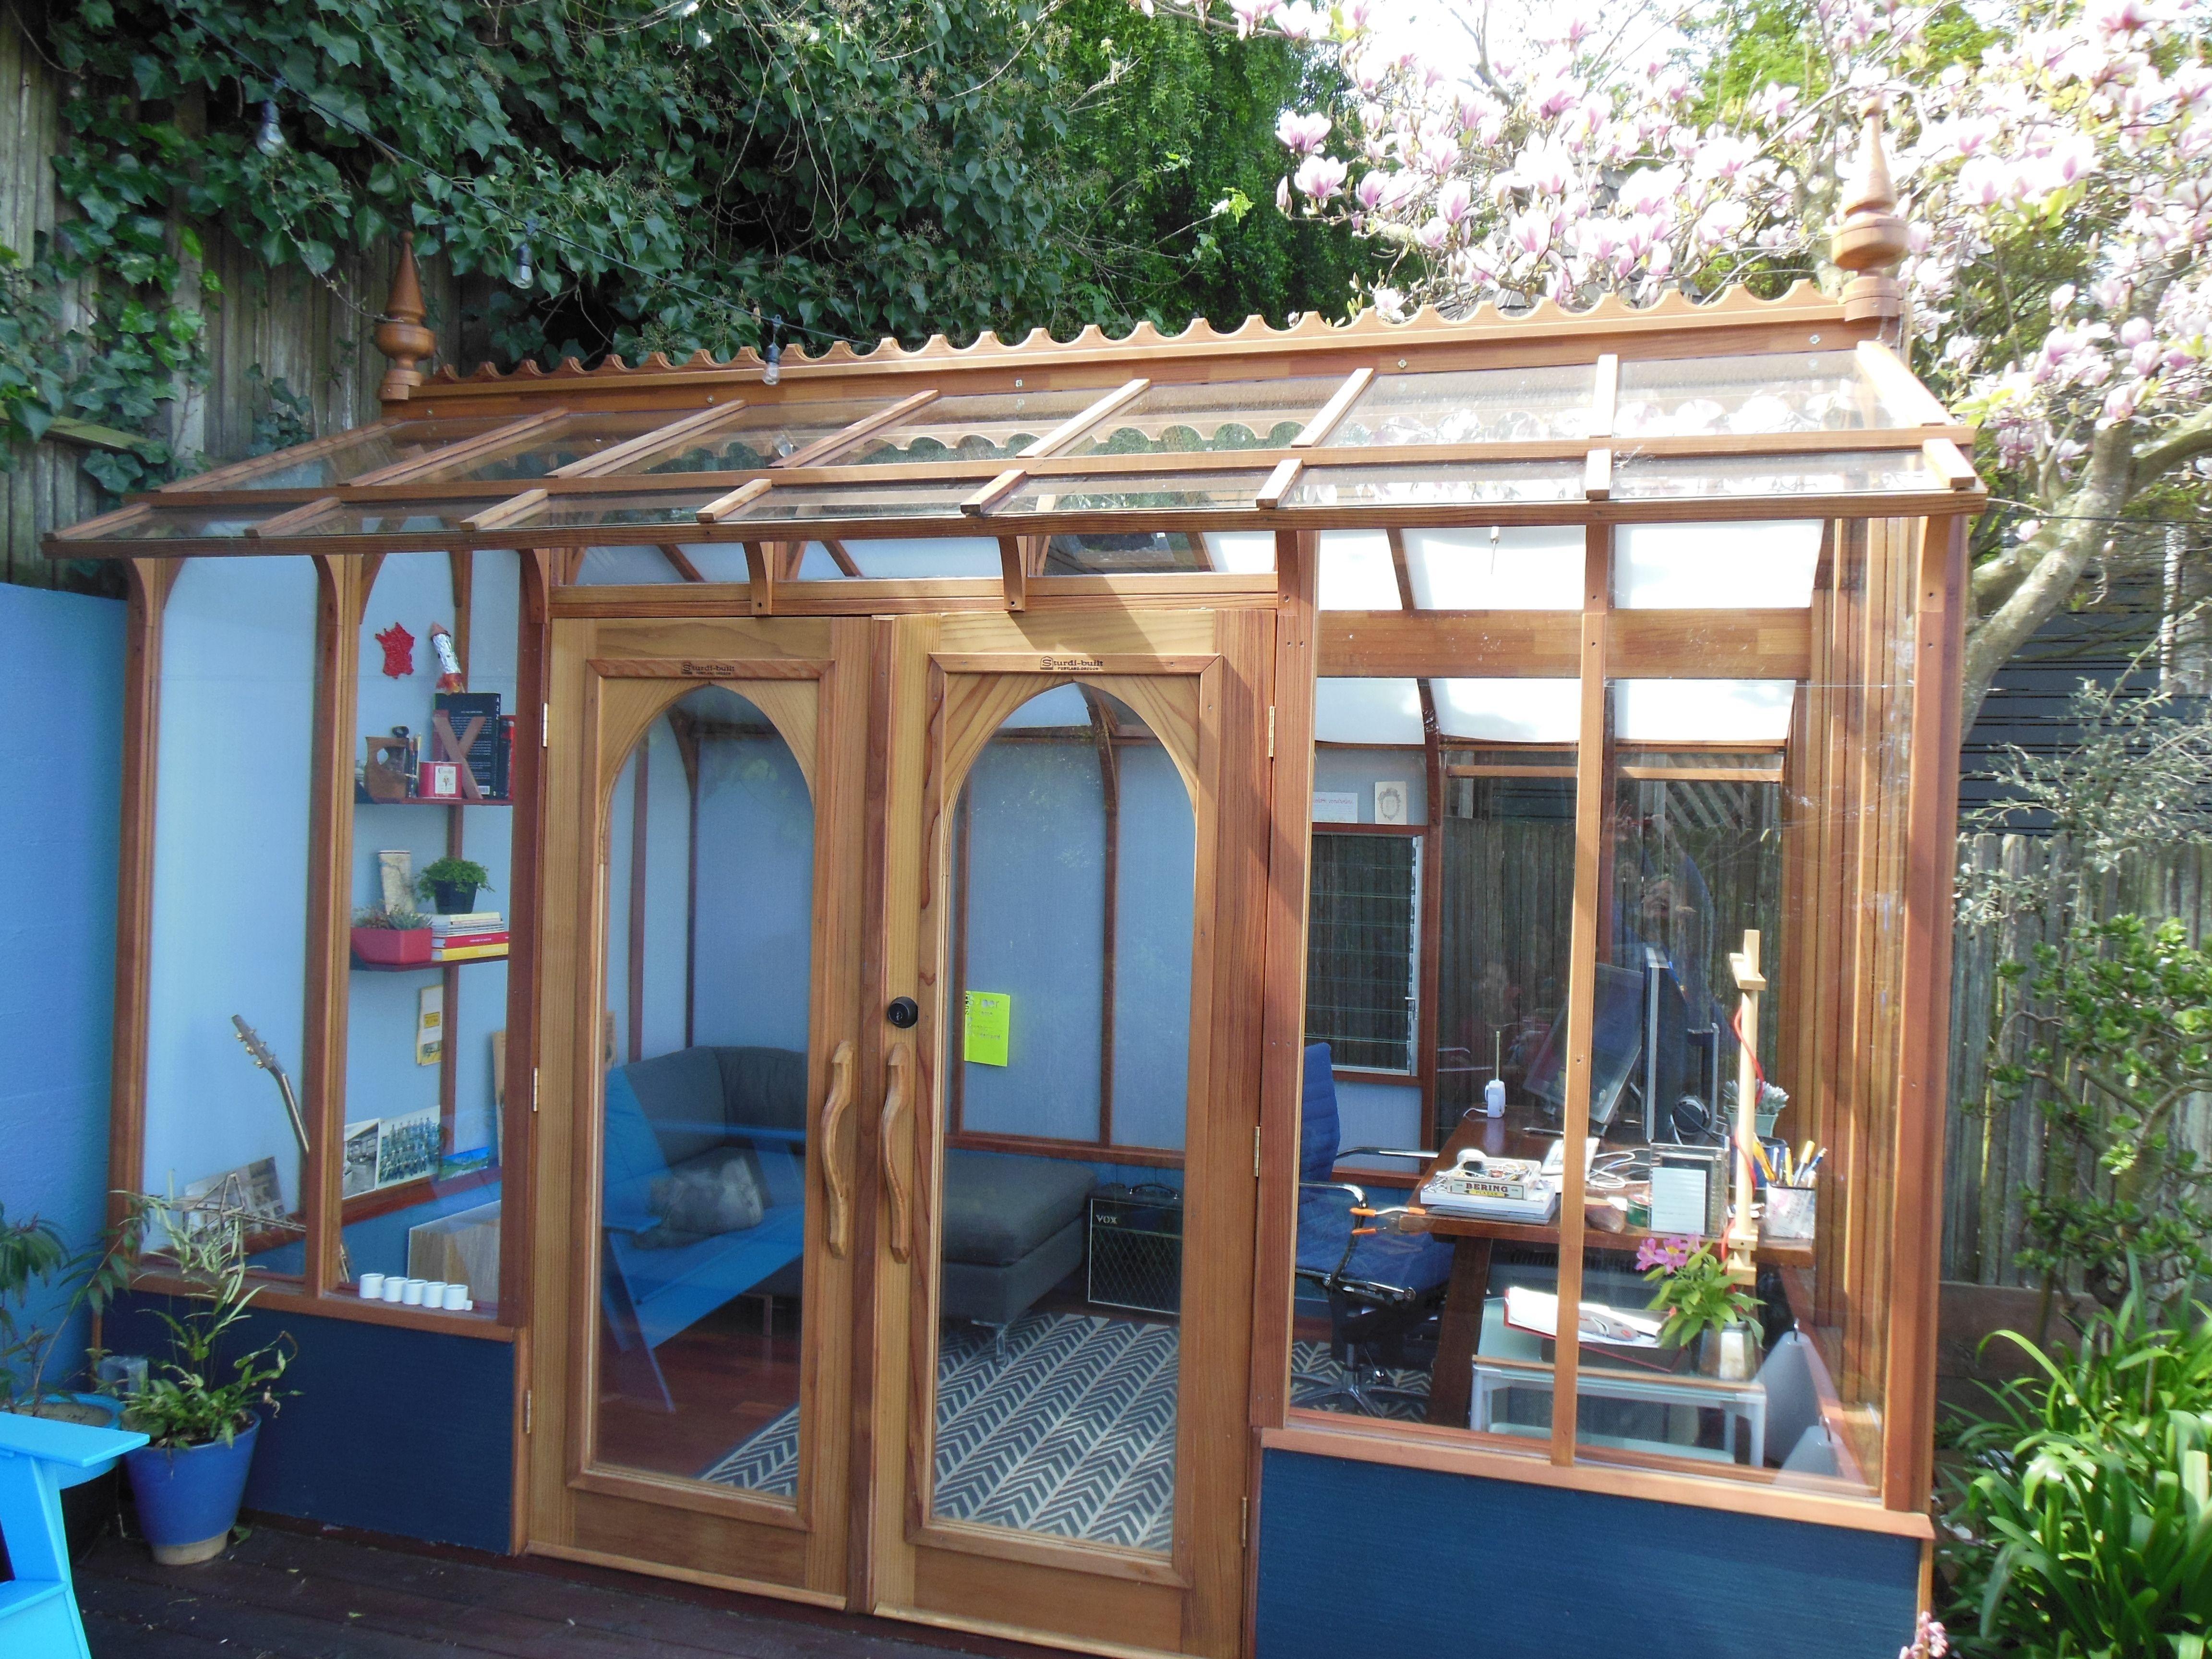 8 X 12 Nantucket Greenhouse Used As A Studio Greenhouse 640 x 480